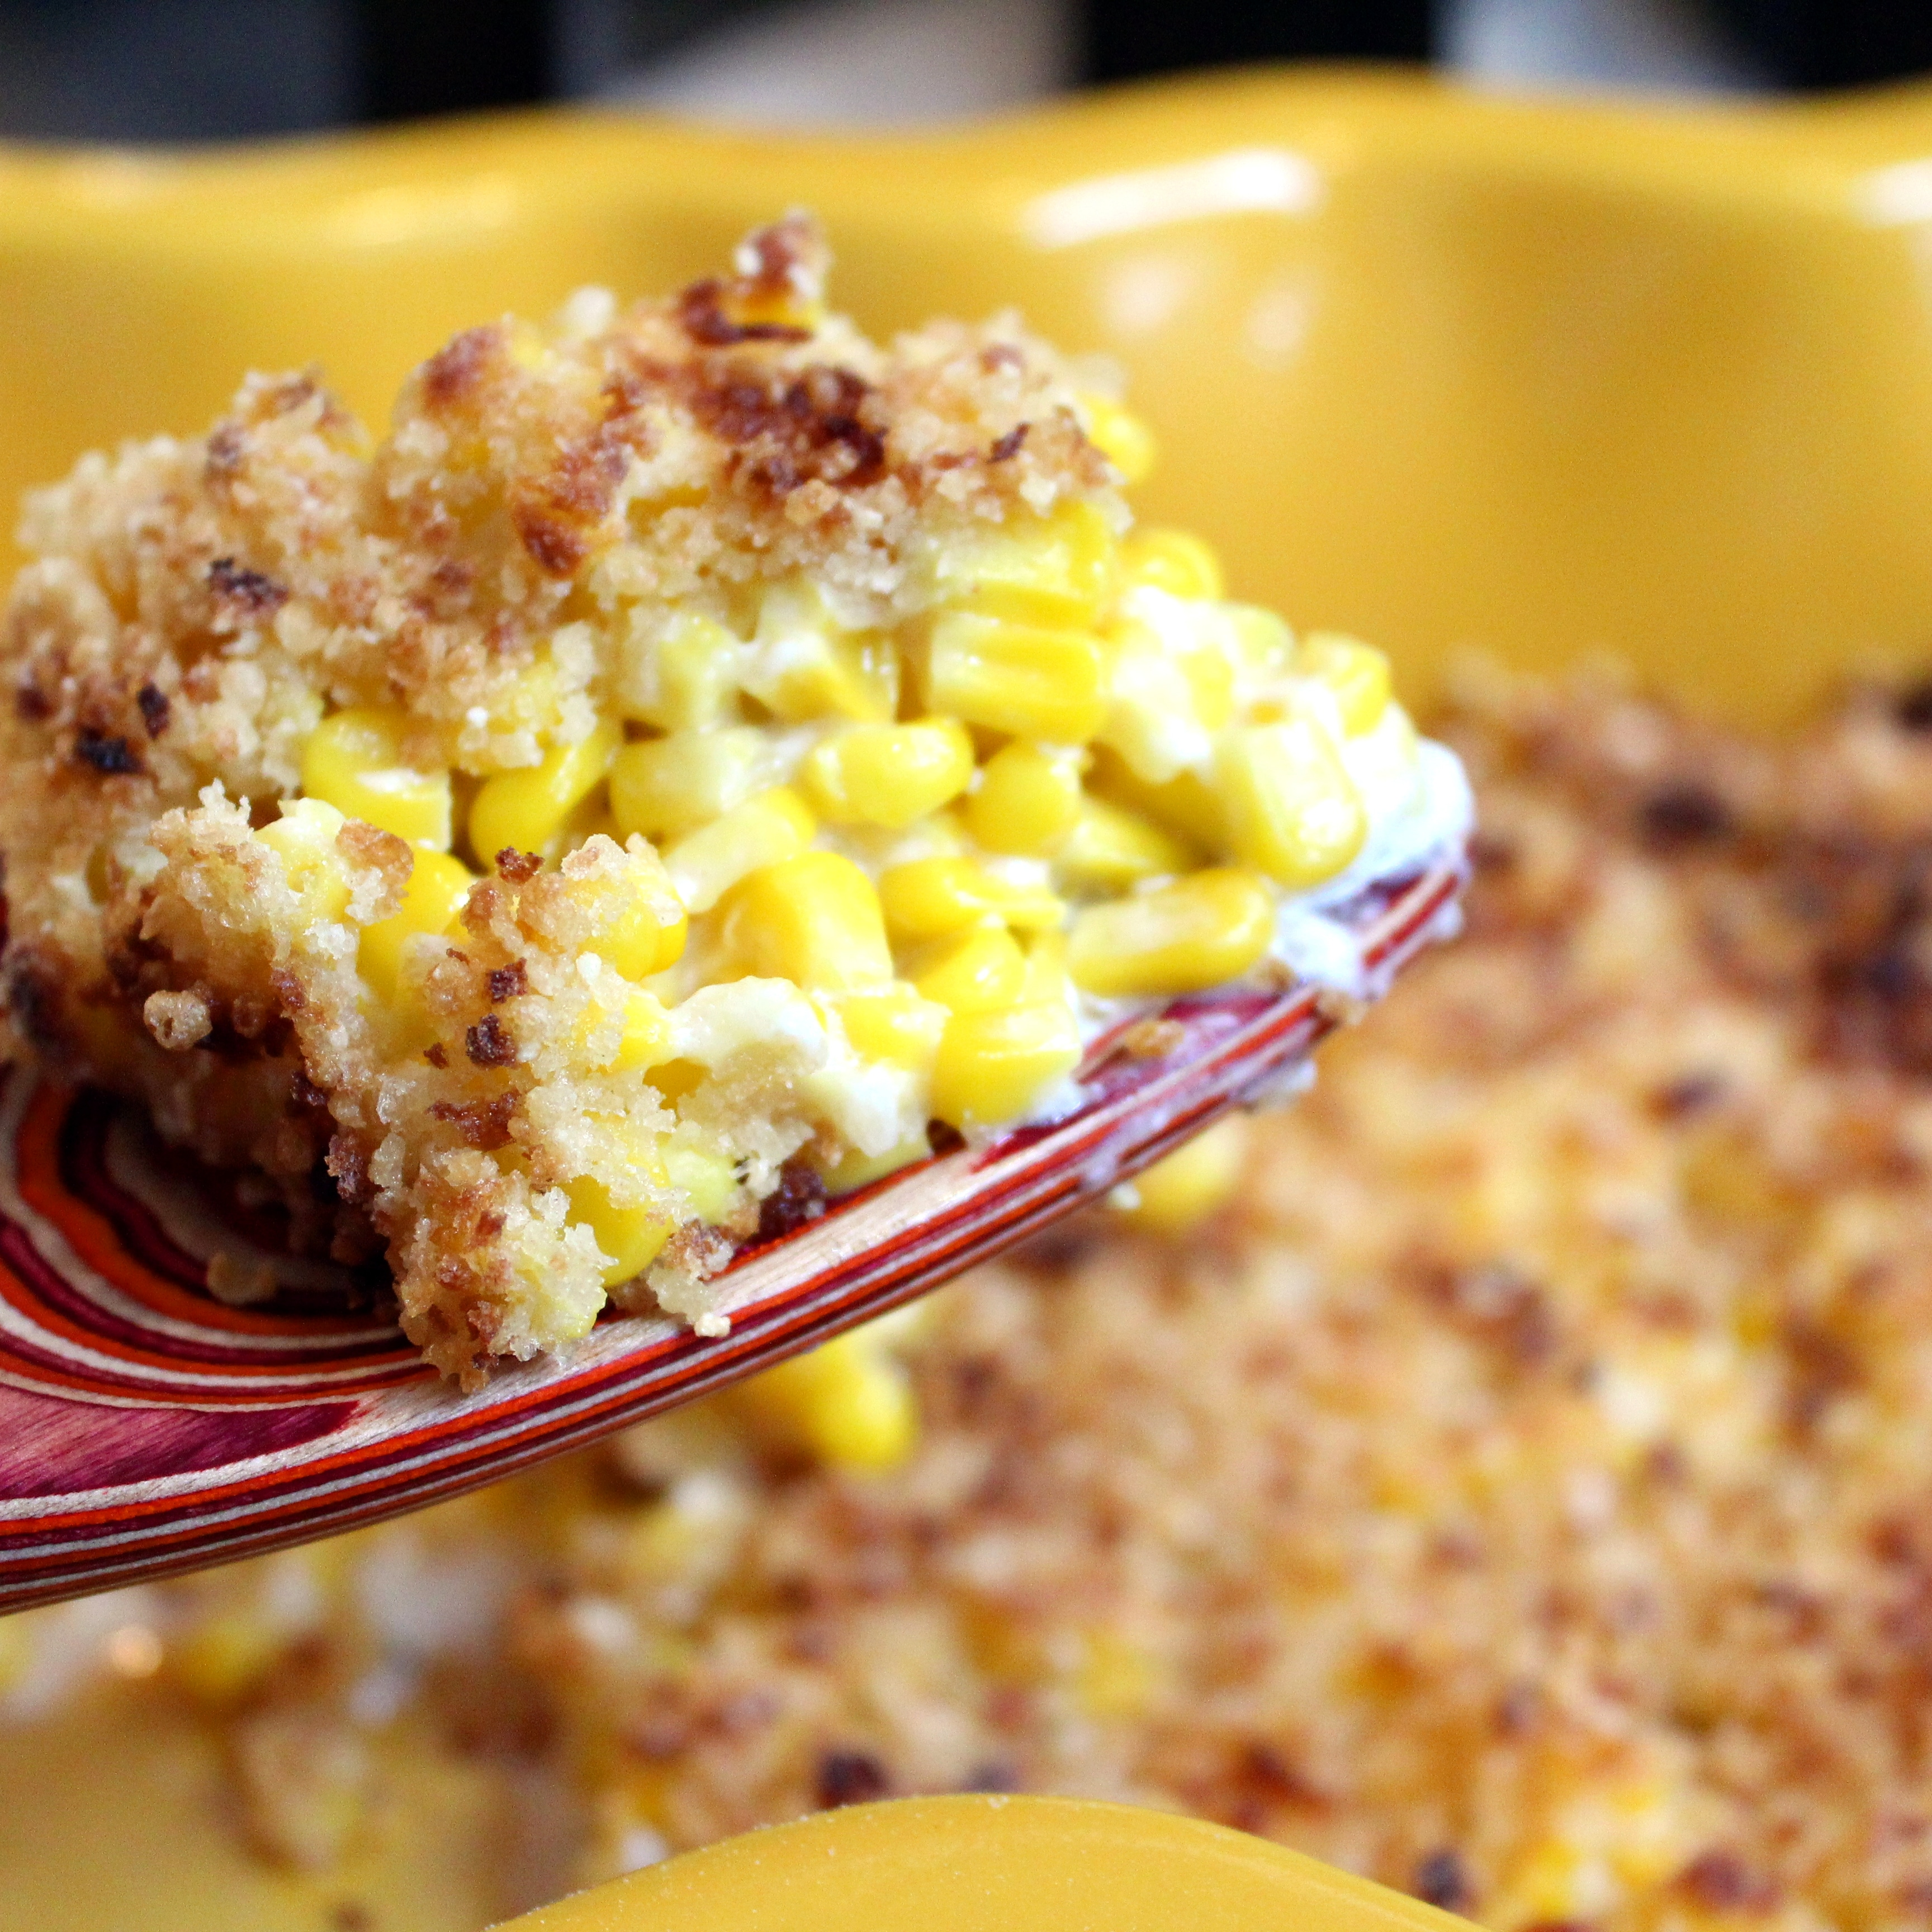 Marian's Creamed Corn DAS